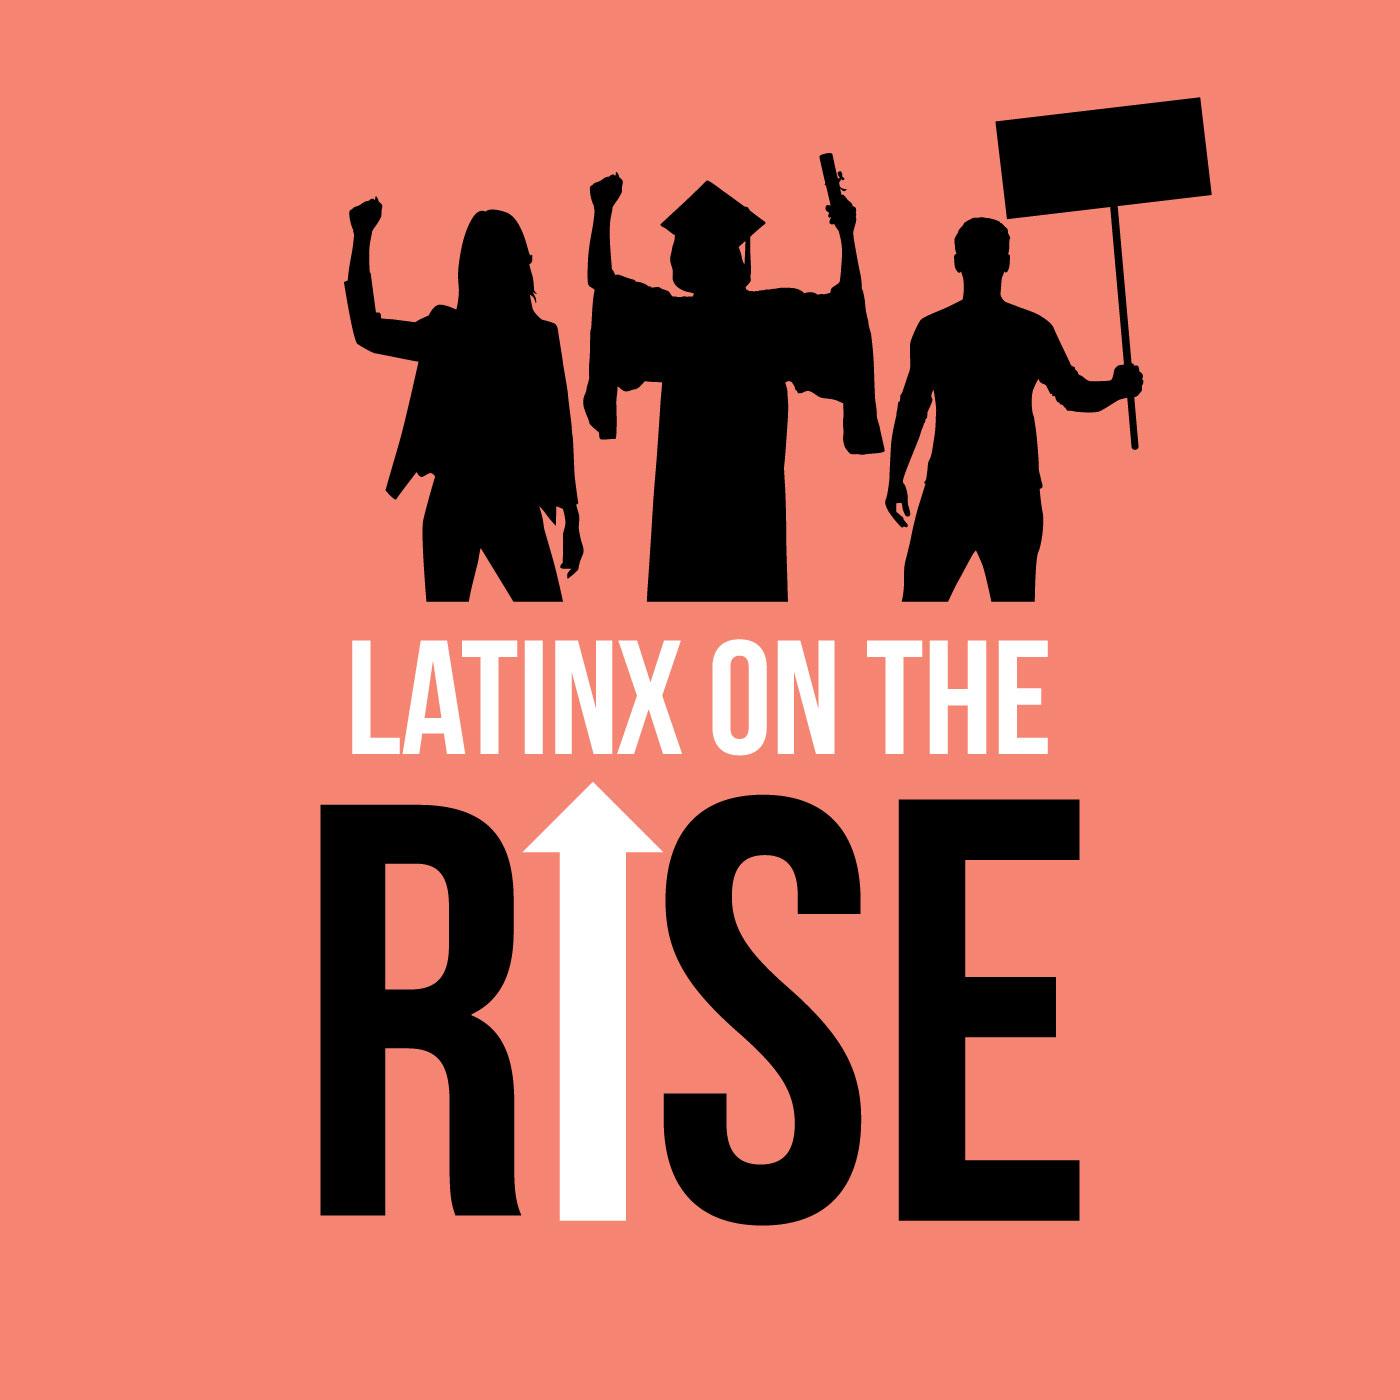 S2 Epi 7 - A conversation with Artist, Activist and Immigration Lawyer Carolina Rubio MacWright